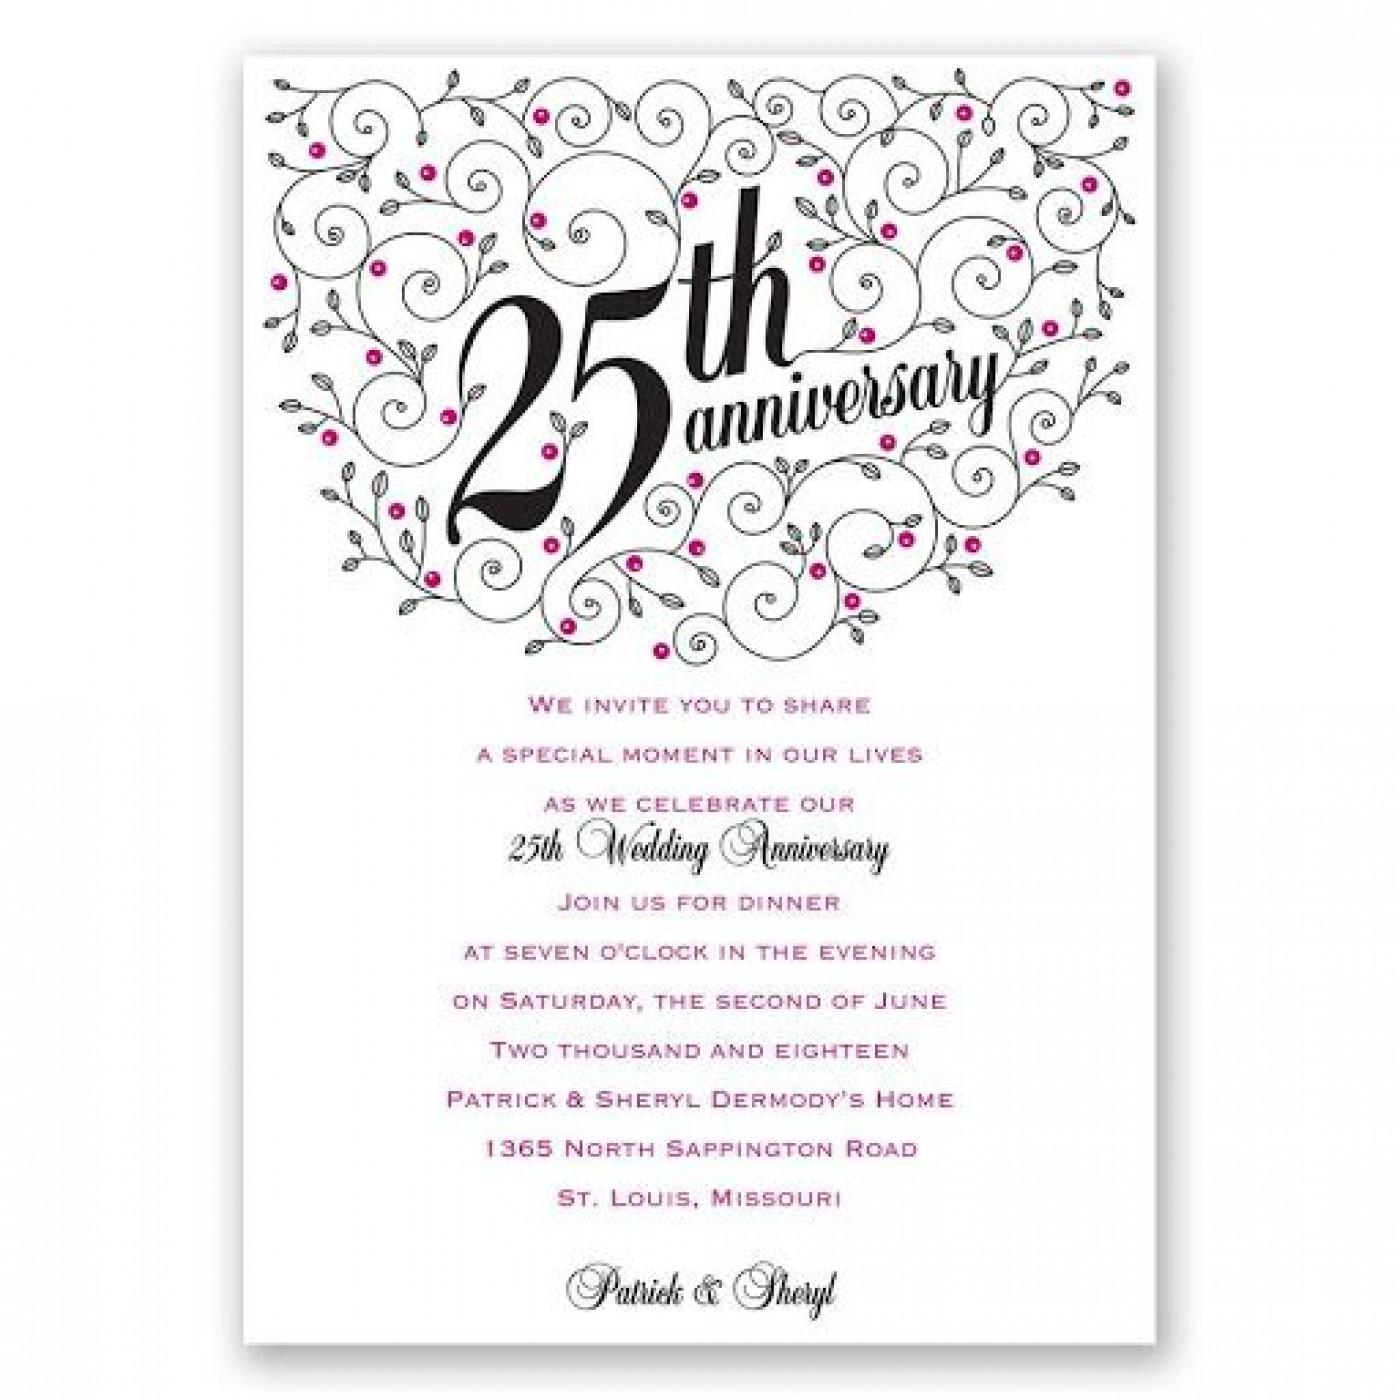 009 Fantastic 50th Anniversary Invitation Wording Sample Highest Clarity  Wedding 60th In Tamil Birthday1400